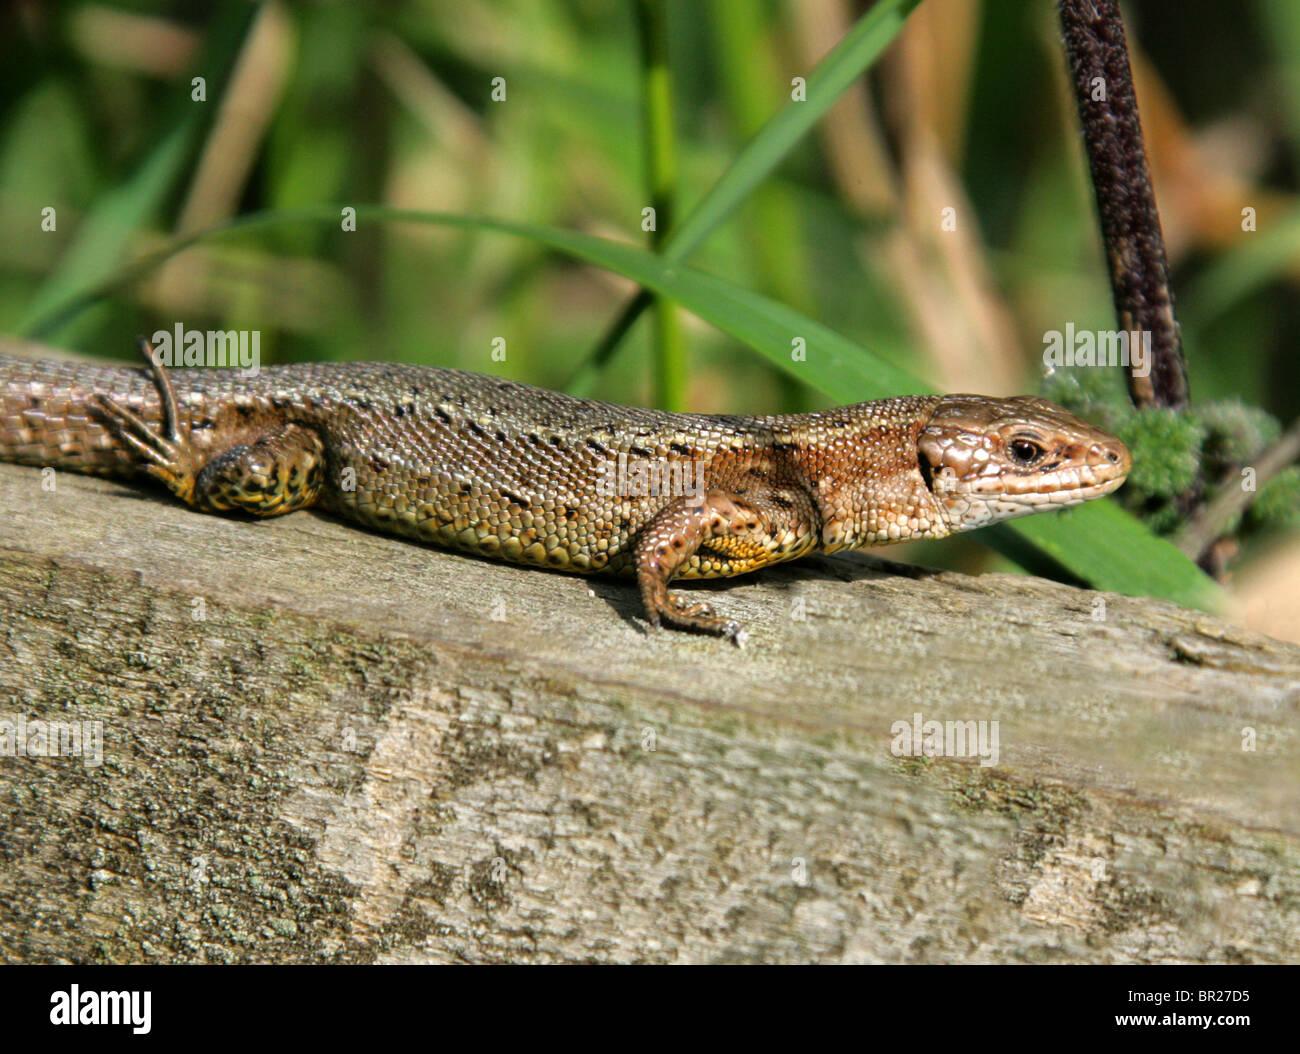 Männliche gemeinsamen oder lebendgebärend Eidechse, Zootoca Vivipara, (vormals Lacerta Vivipara), Lacertilia, Squamata, Reptilia, Lacertidae. Stockfoto